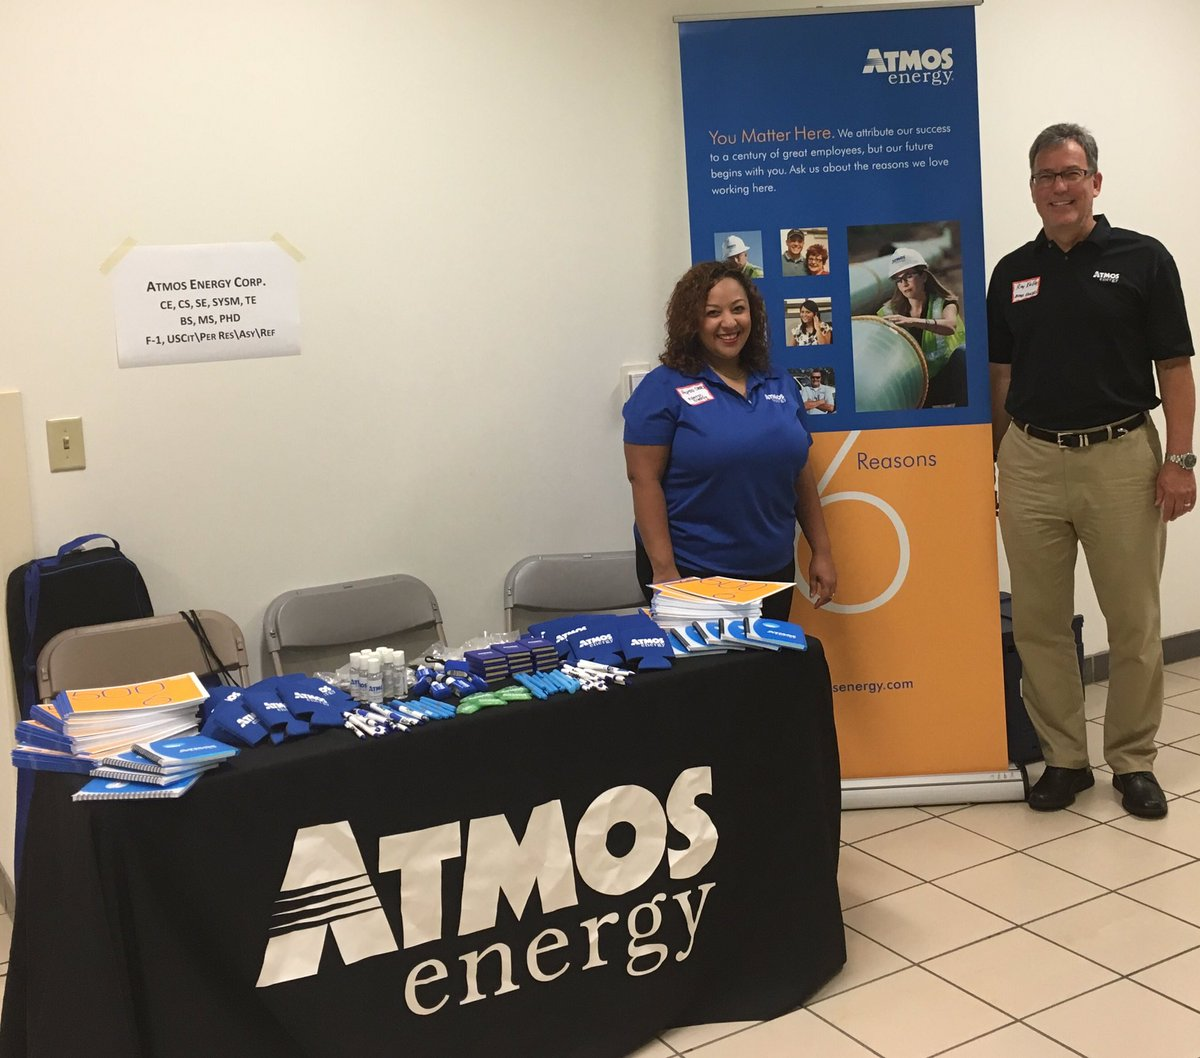 Atmos Energy Atmosenergy Twitter